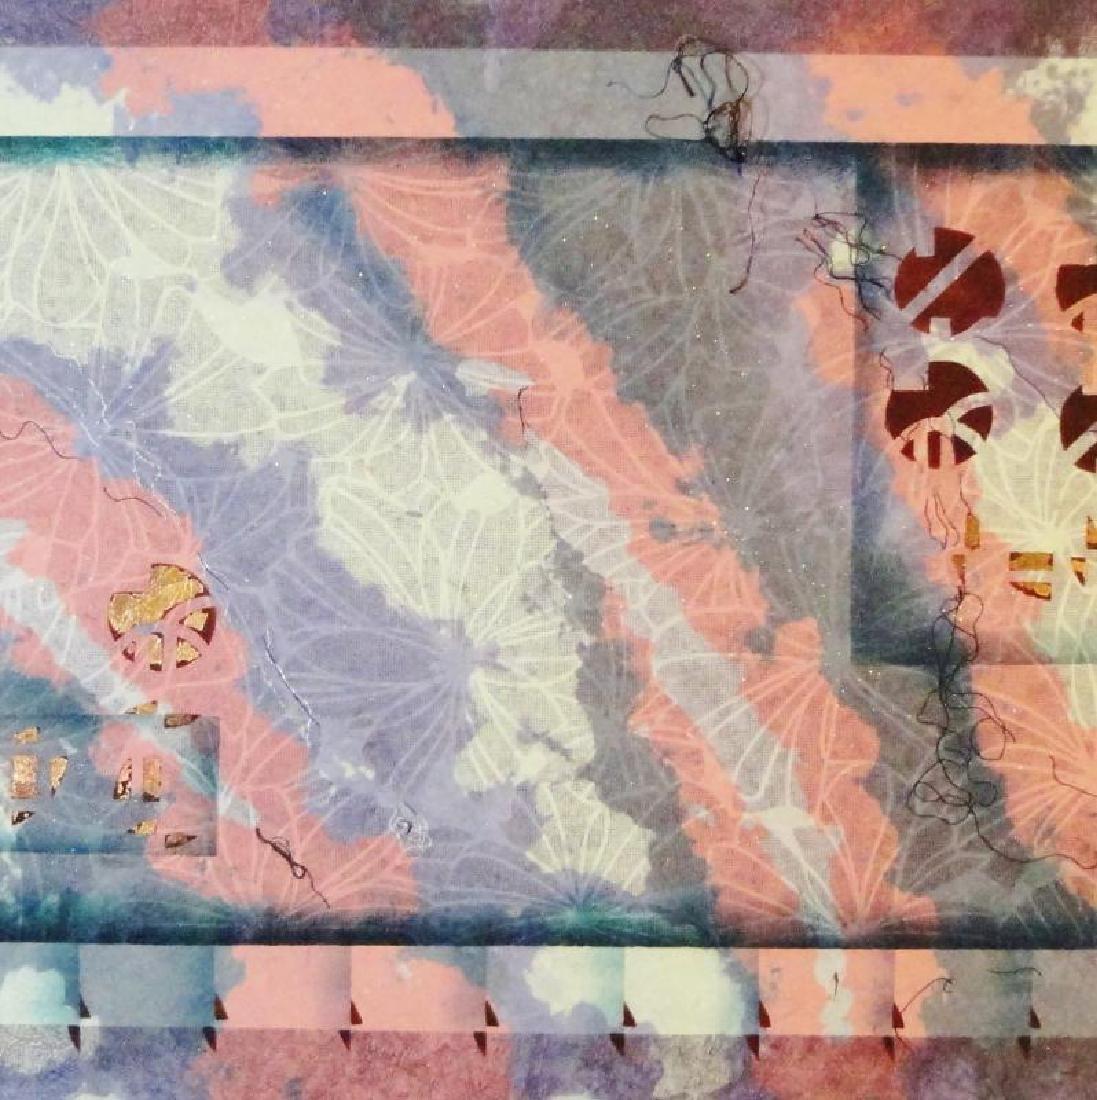 Abstract Texture Huge Dealer Sale Buy Cheap - 3